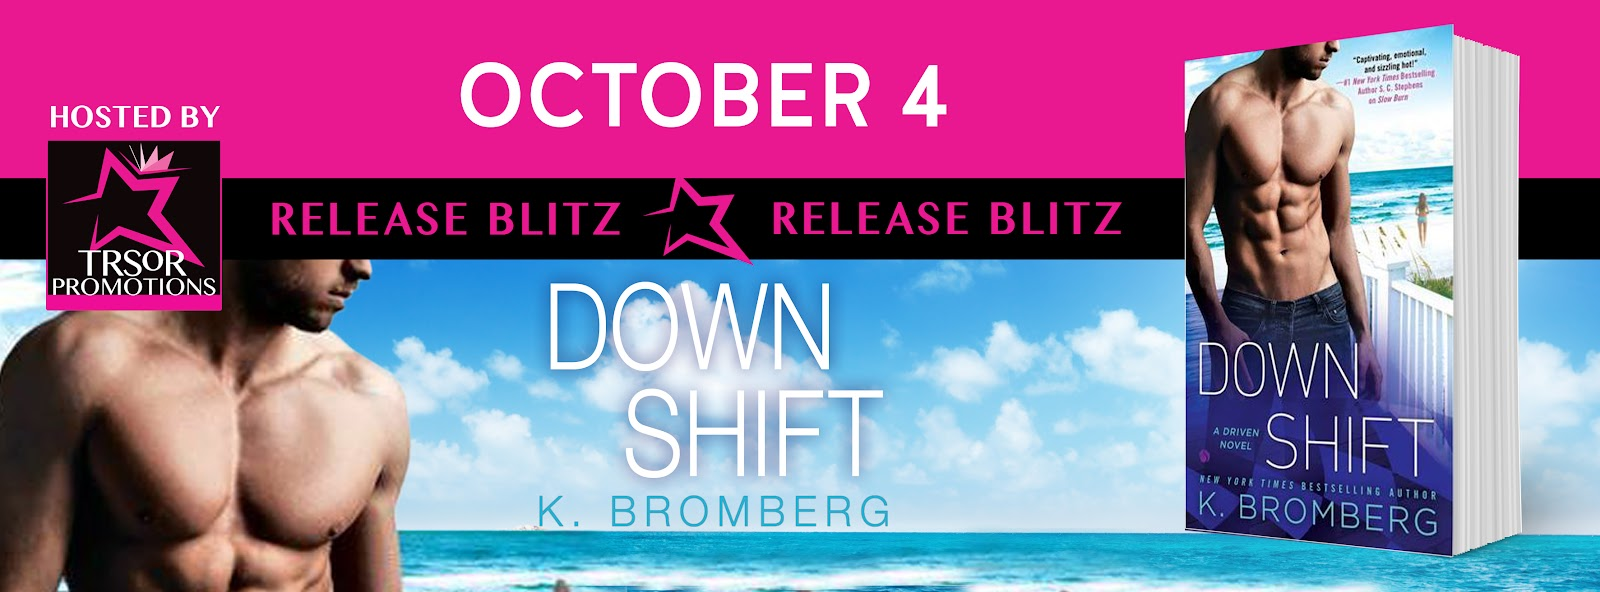 DOWN_SHIFT_RELEASE_BLITZ.jpg